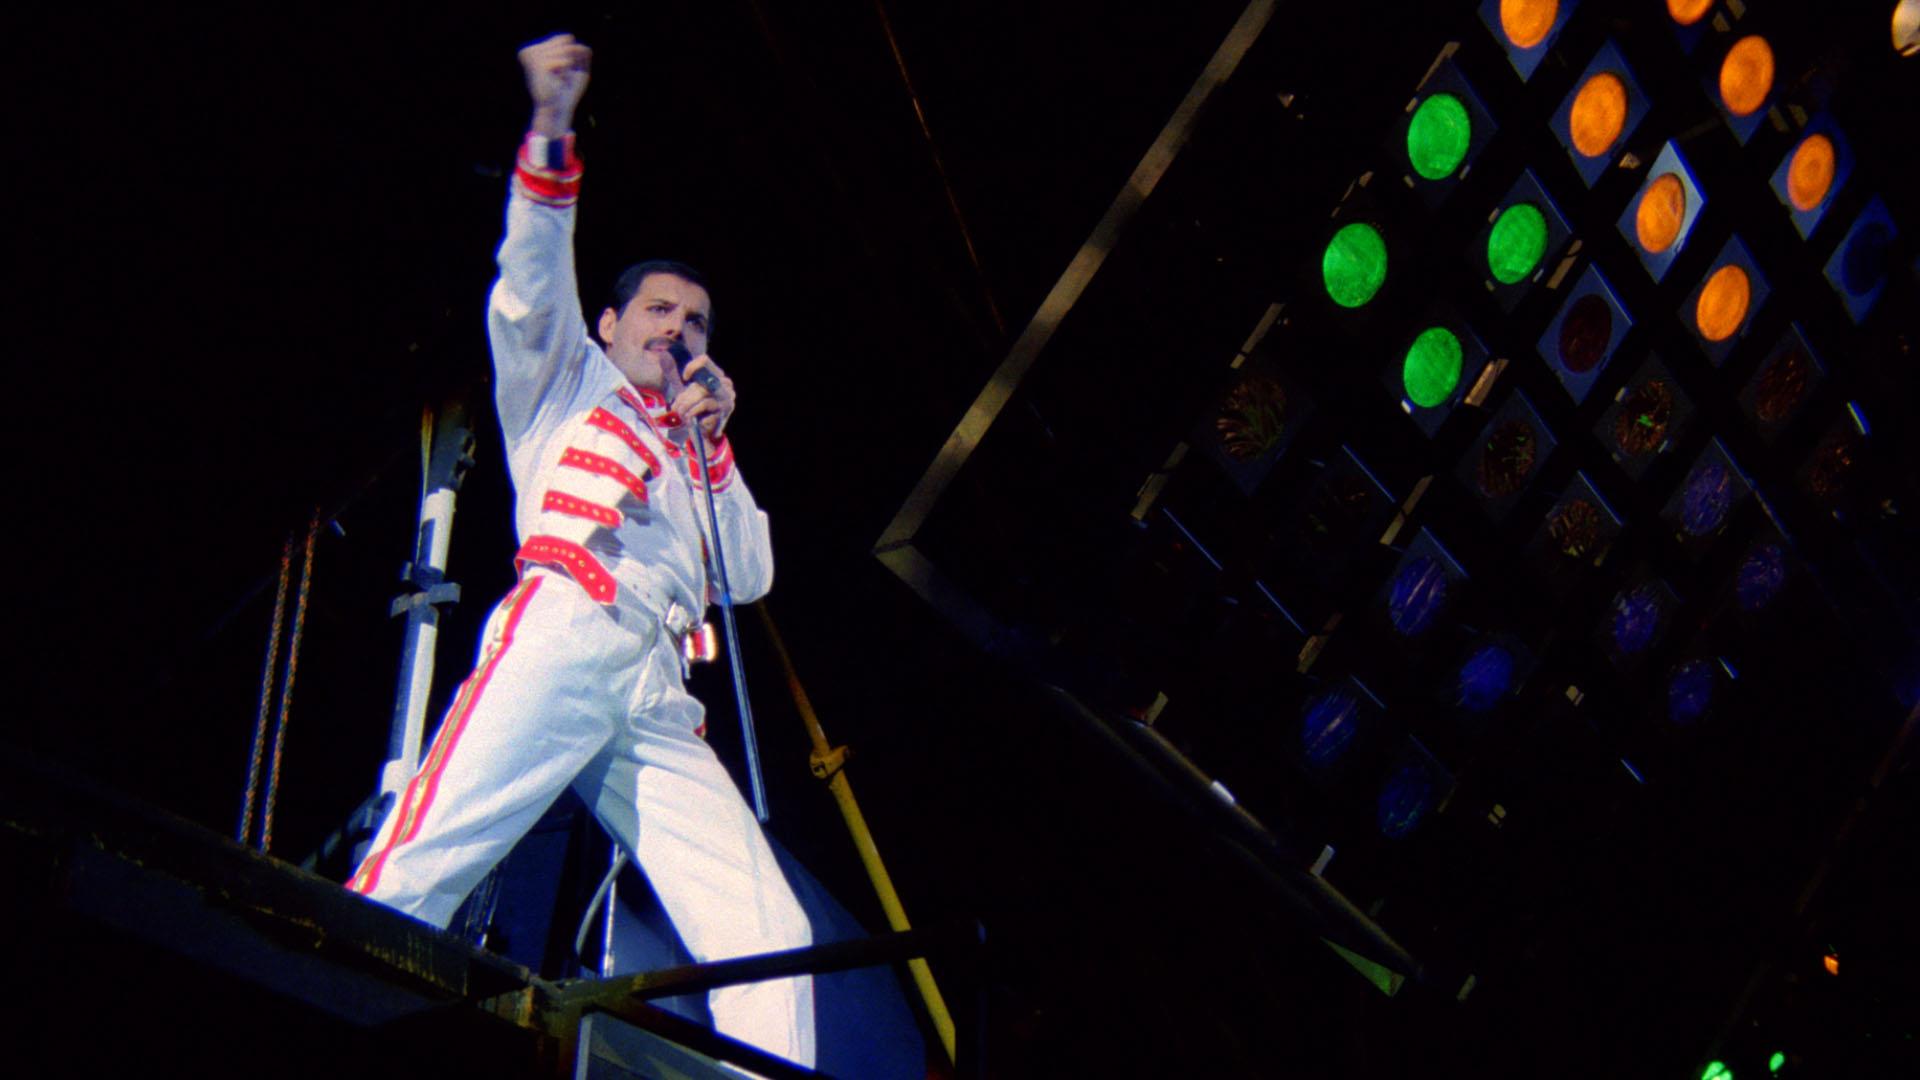 Queen - Hungarian Rhapsody